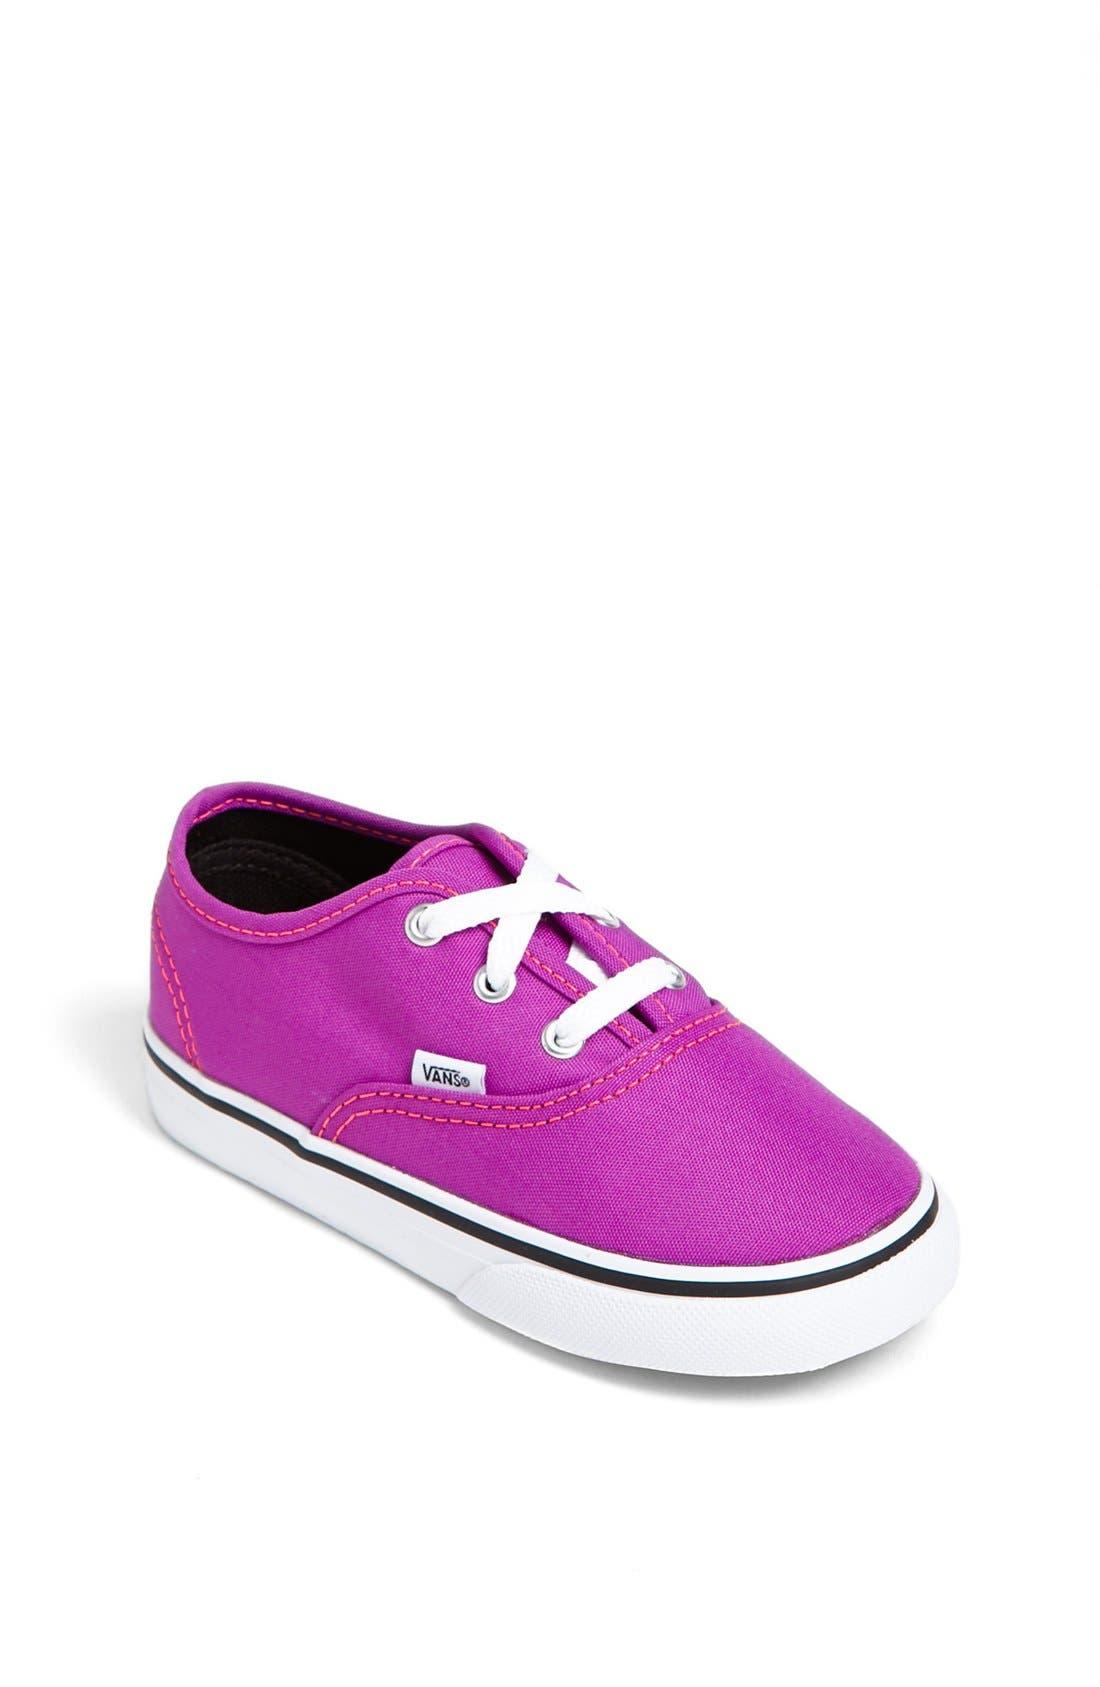 Alternate Image 1 Selected - Vans 'Authentic' Neon Sneaker (Baby, Walker & Toddler)